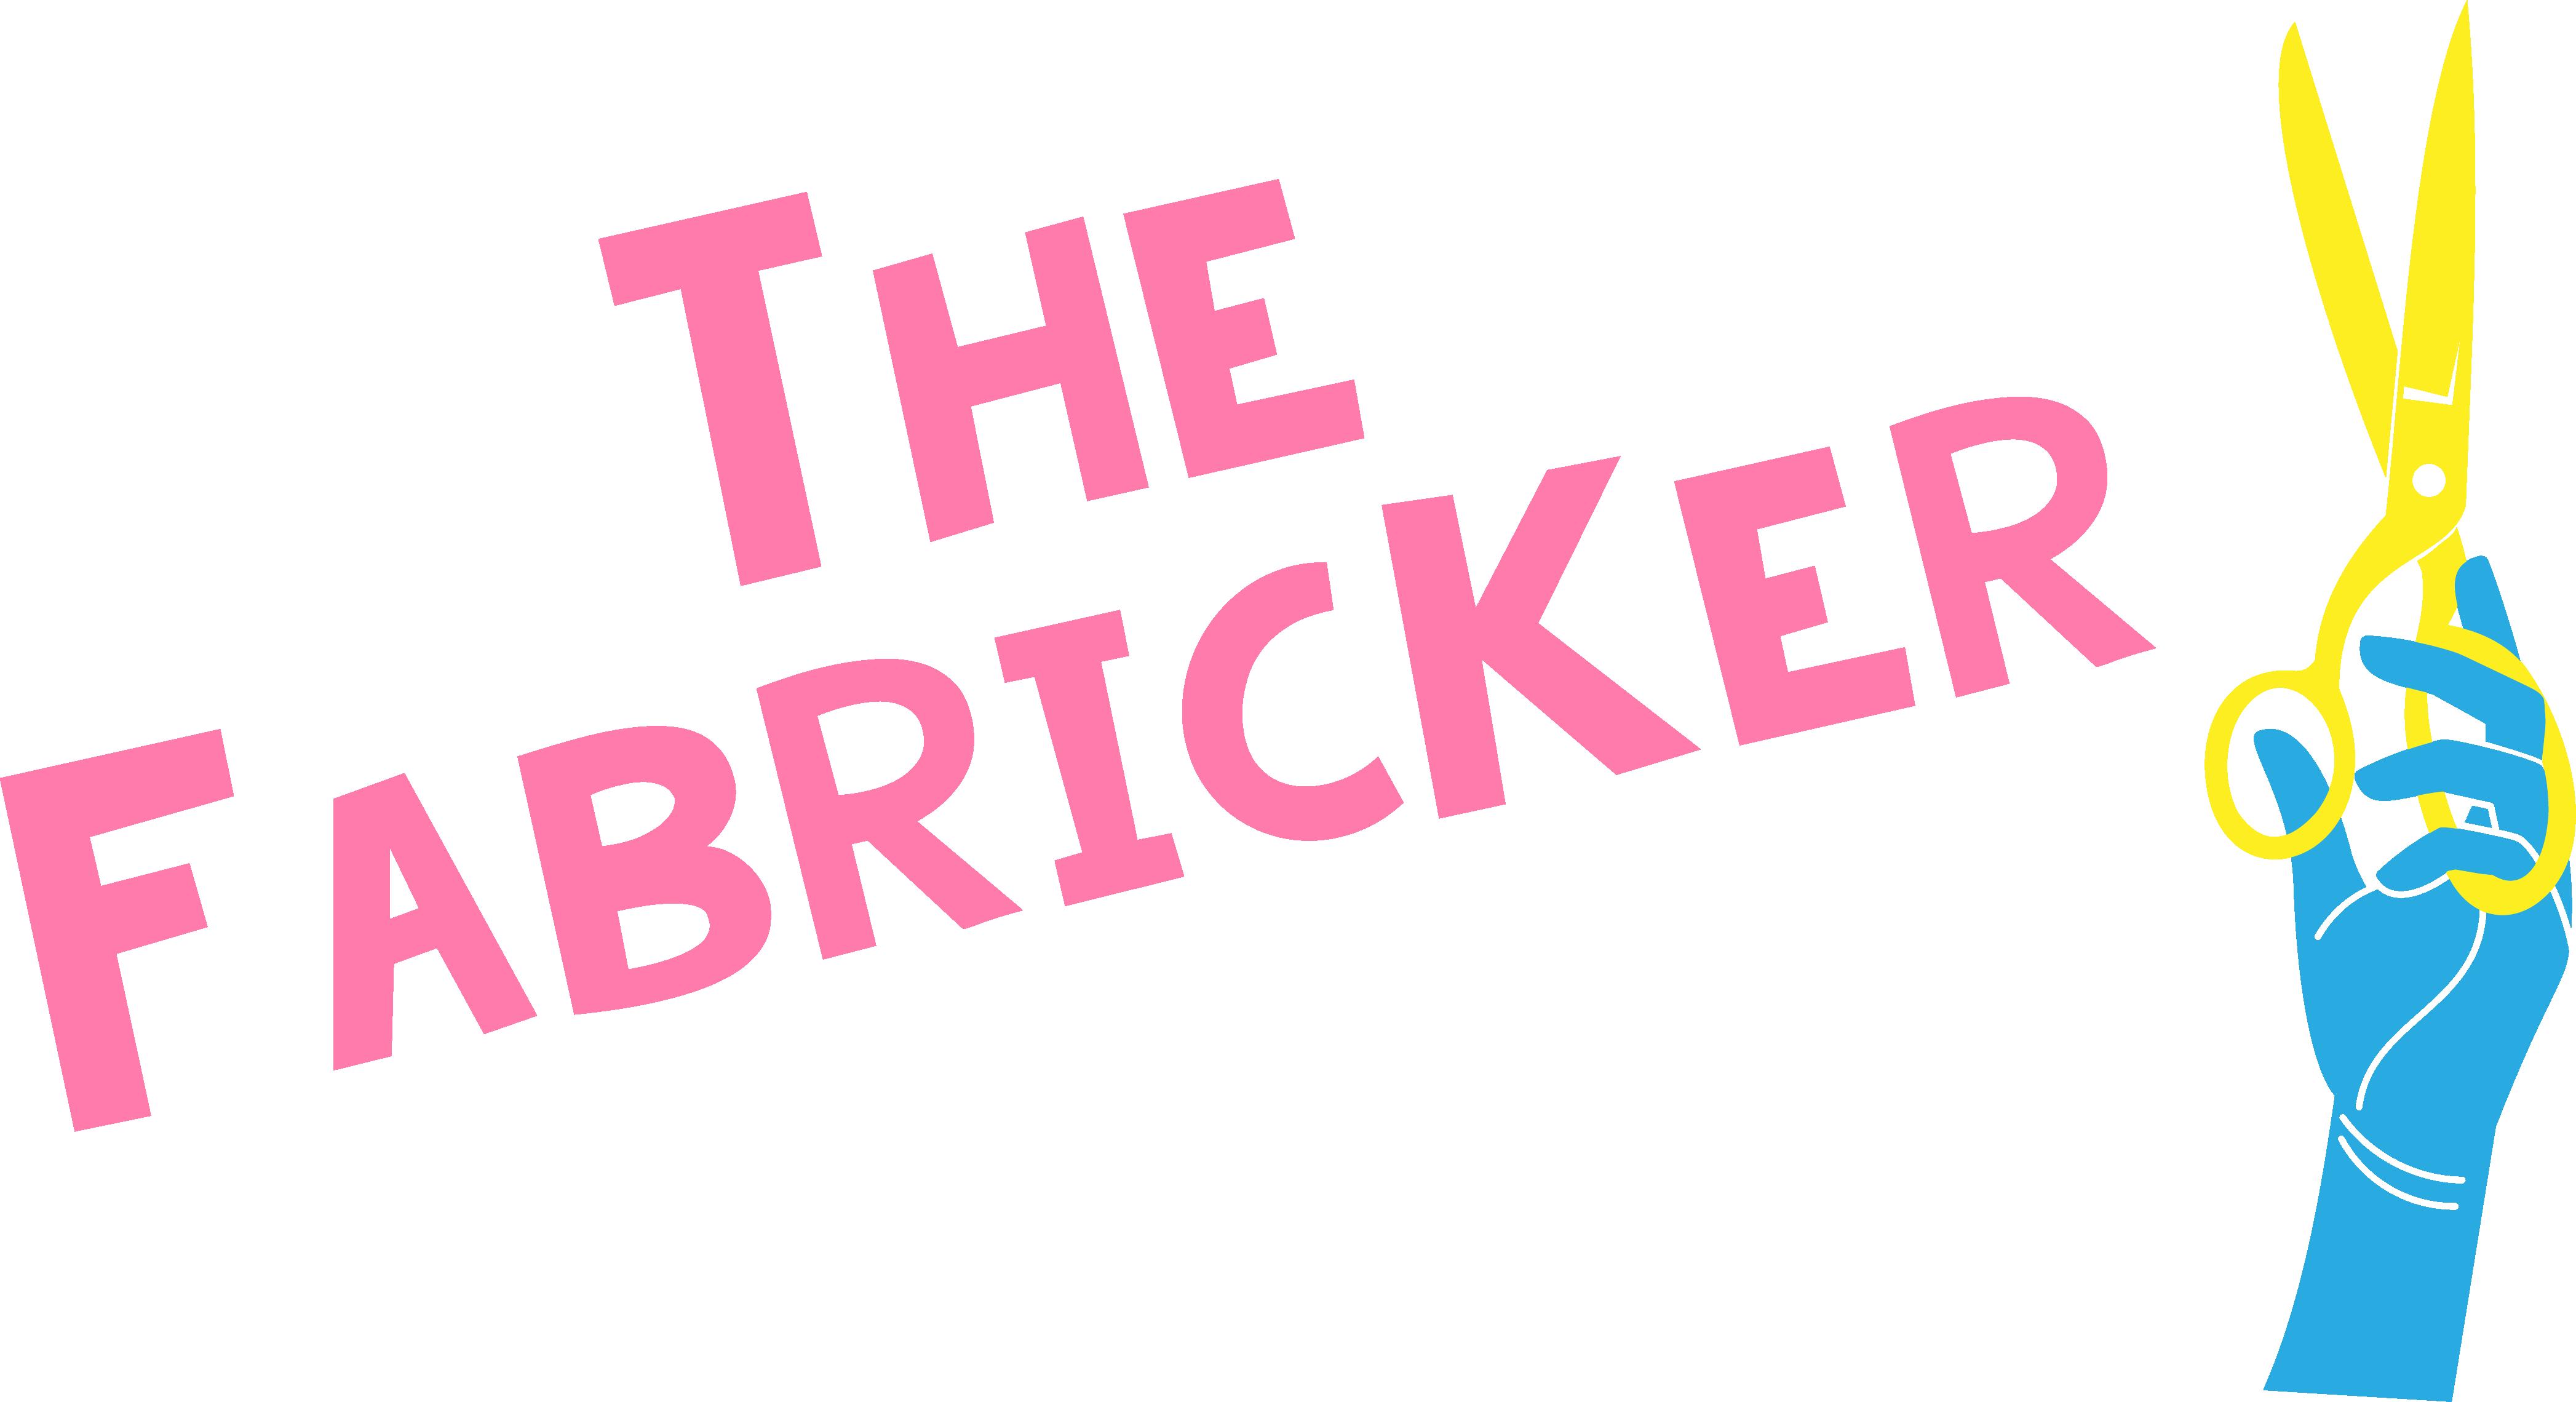 The Fabricker